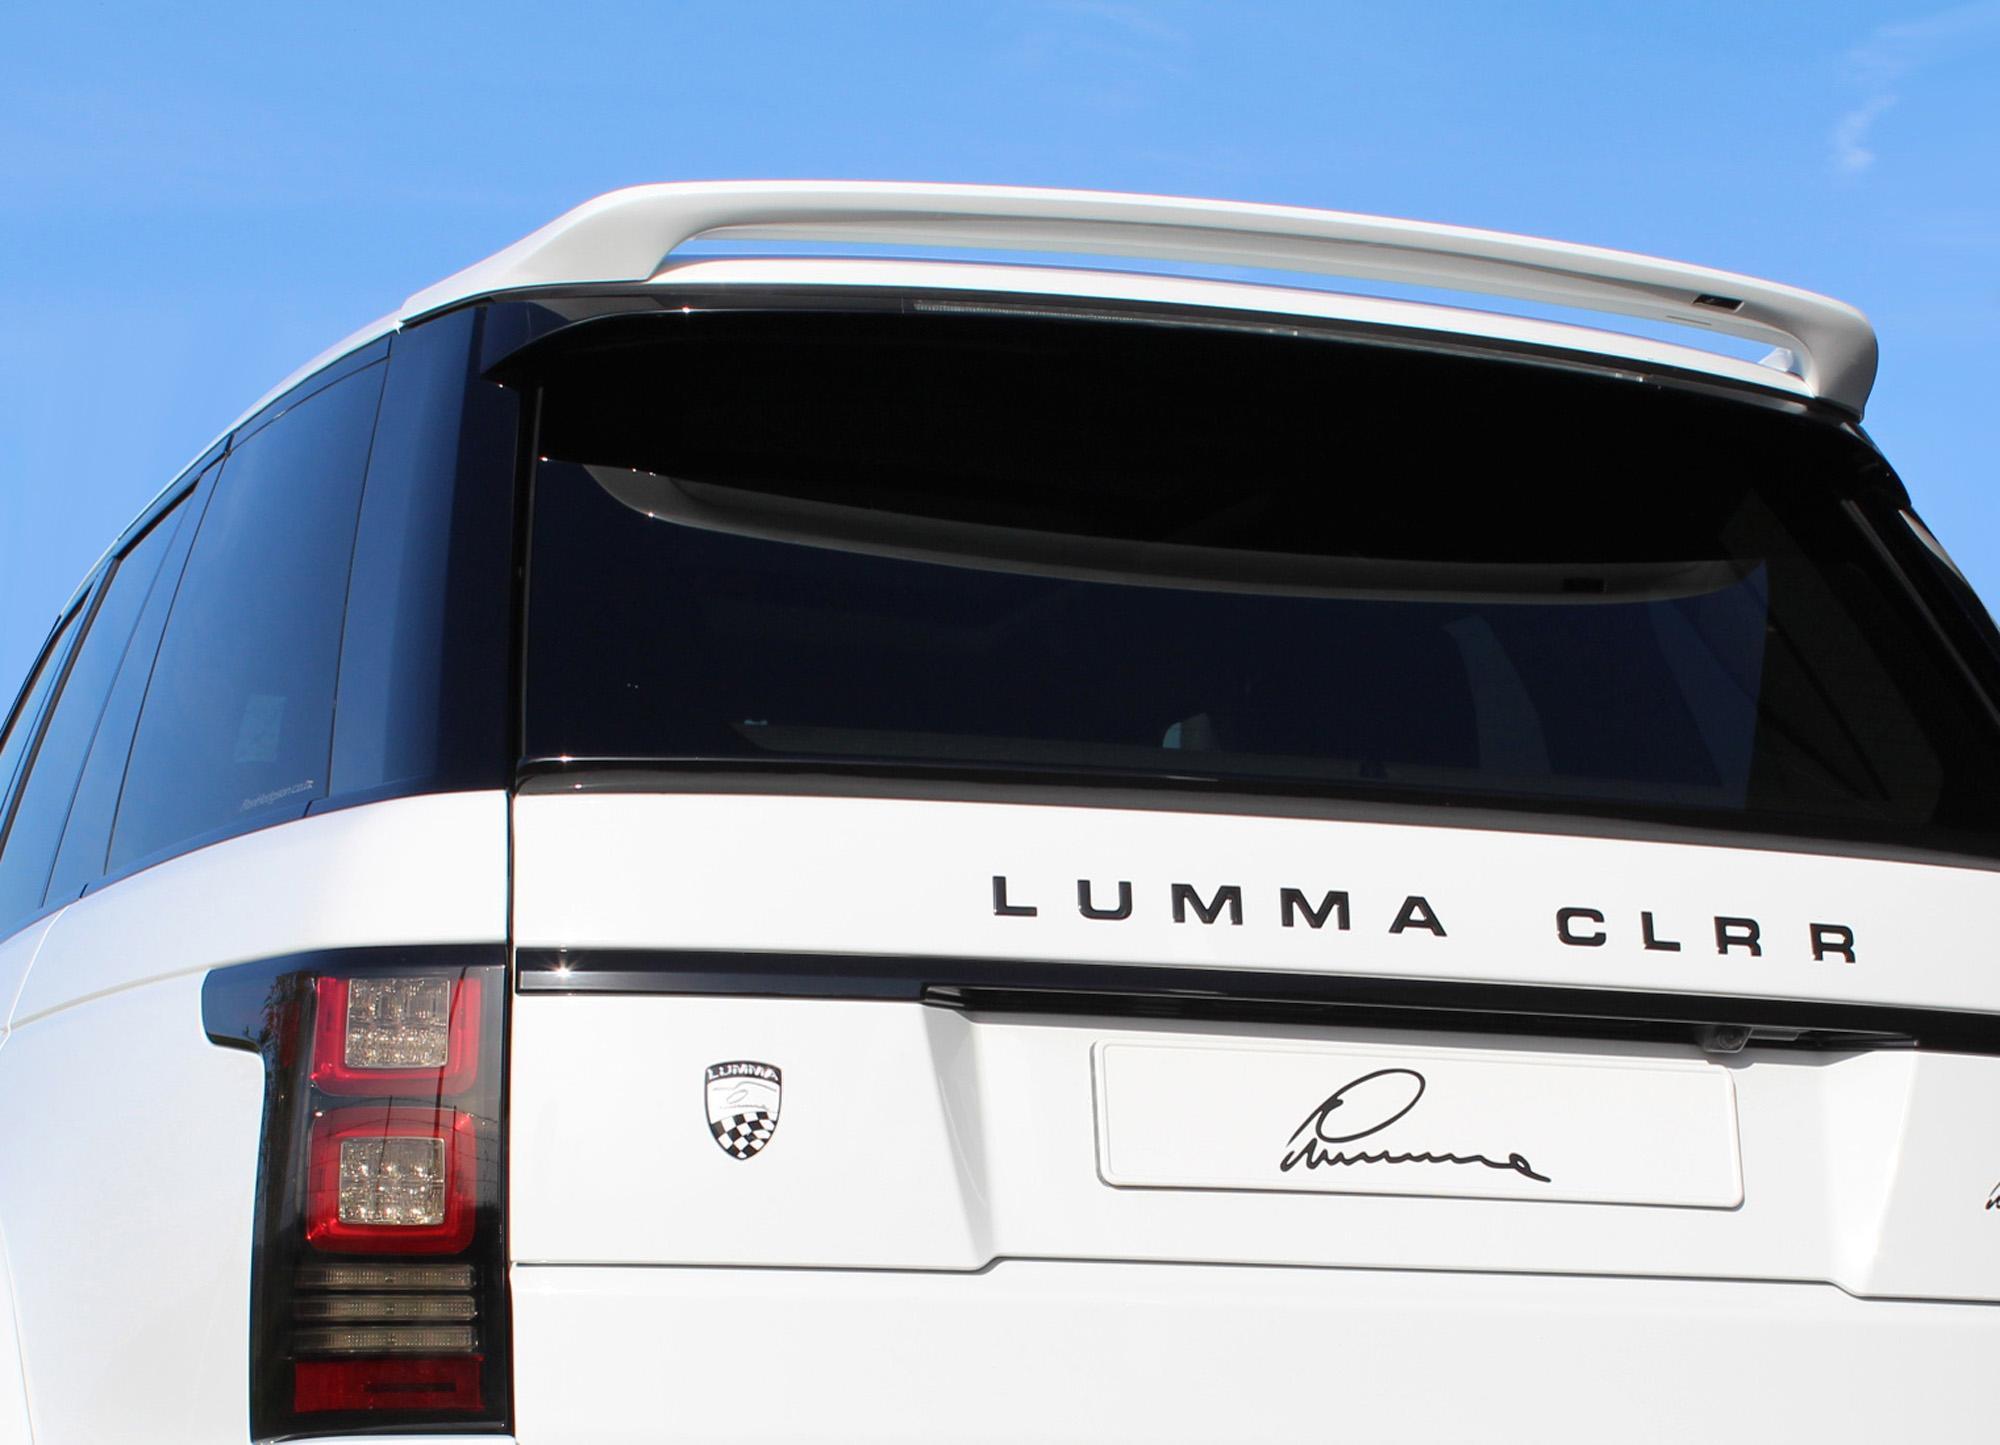 range-rover-lg-lumma-design-clr-r-gt-evo-002